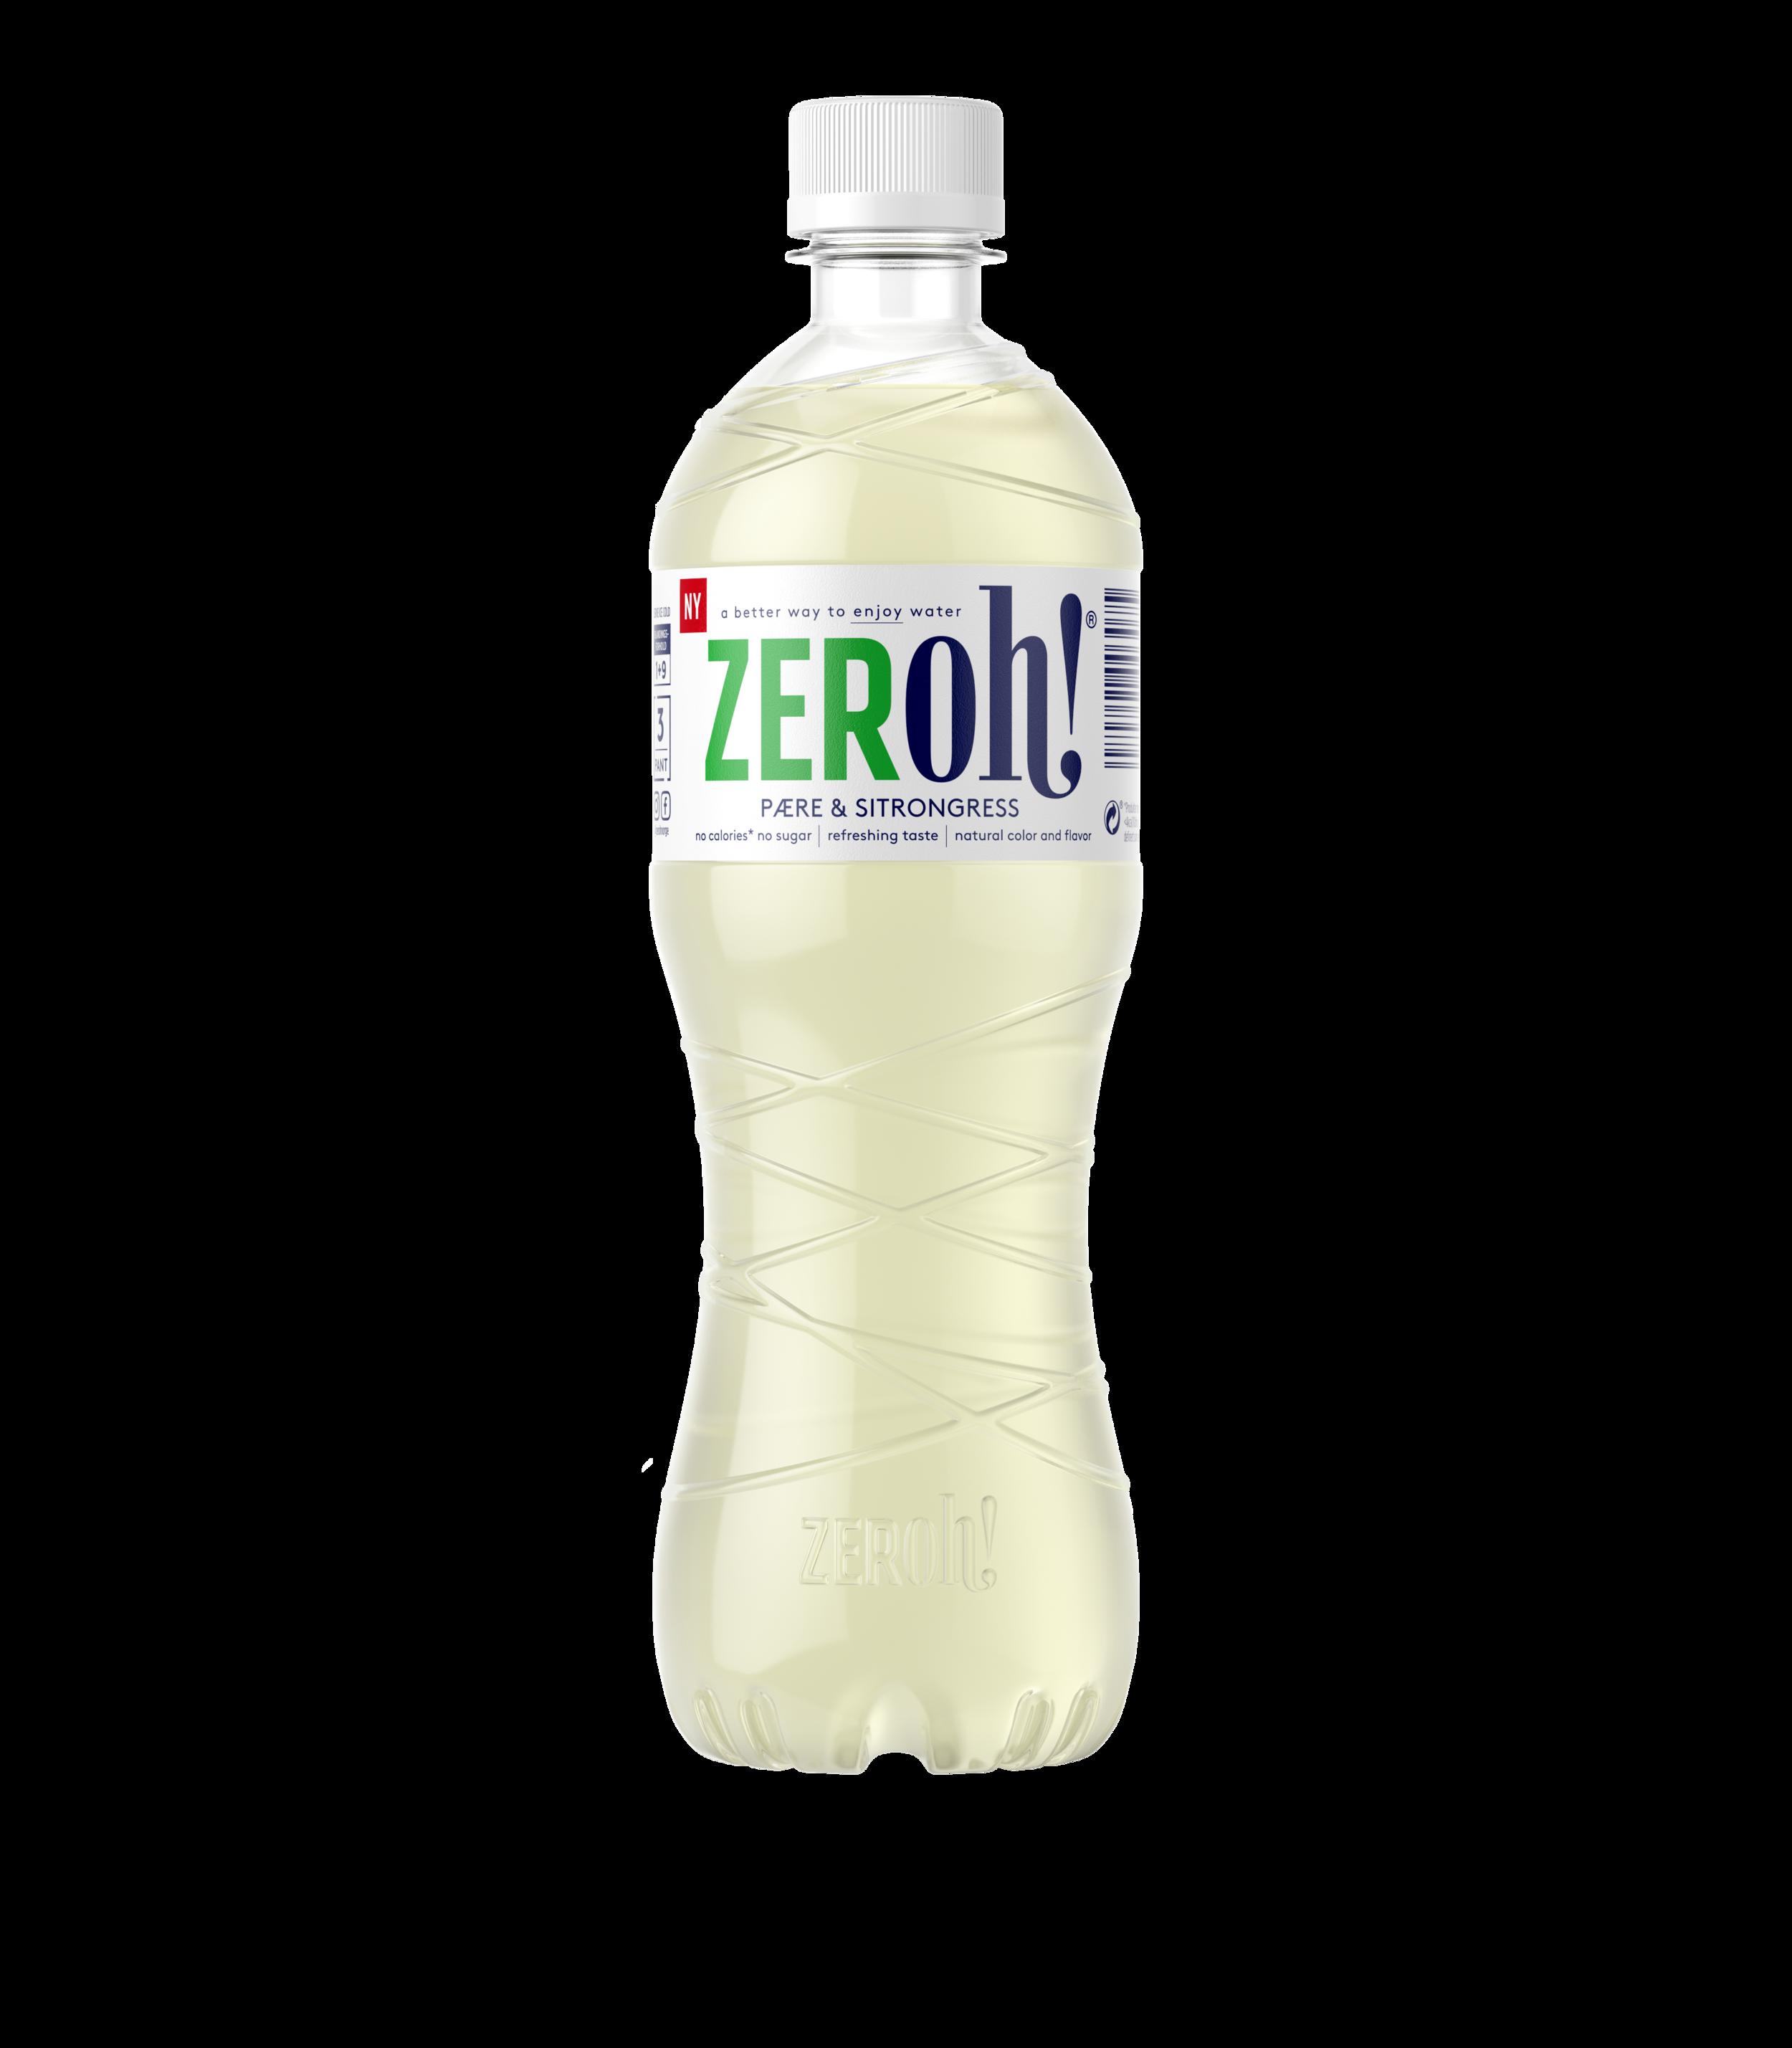 ZERoh! Pære & Sitrongress 2019 3D transparent.png